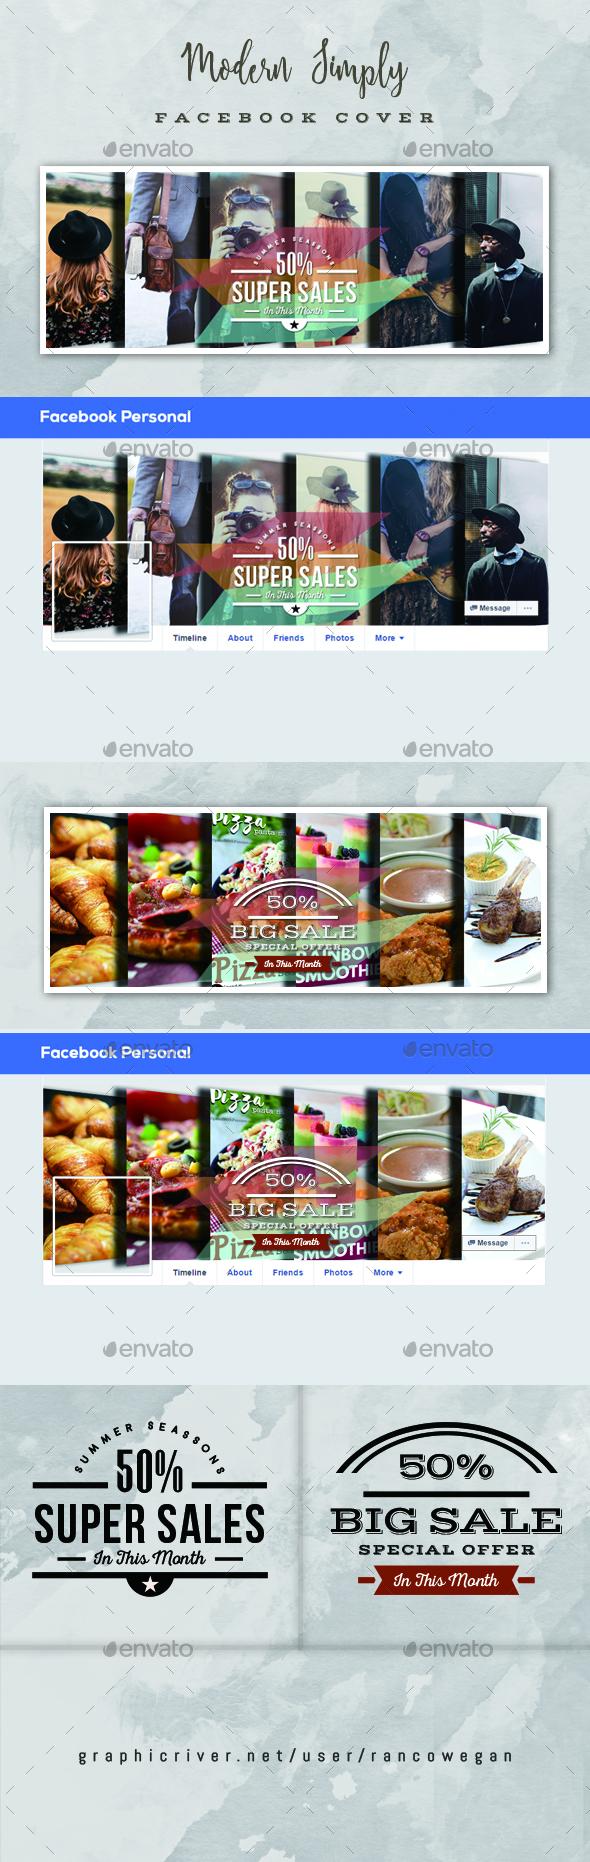 Modern Simply Facebook Cover Vol. 1 - Social Media Web Elements